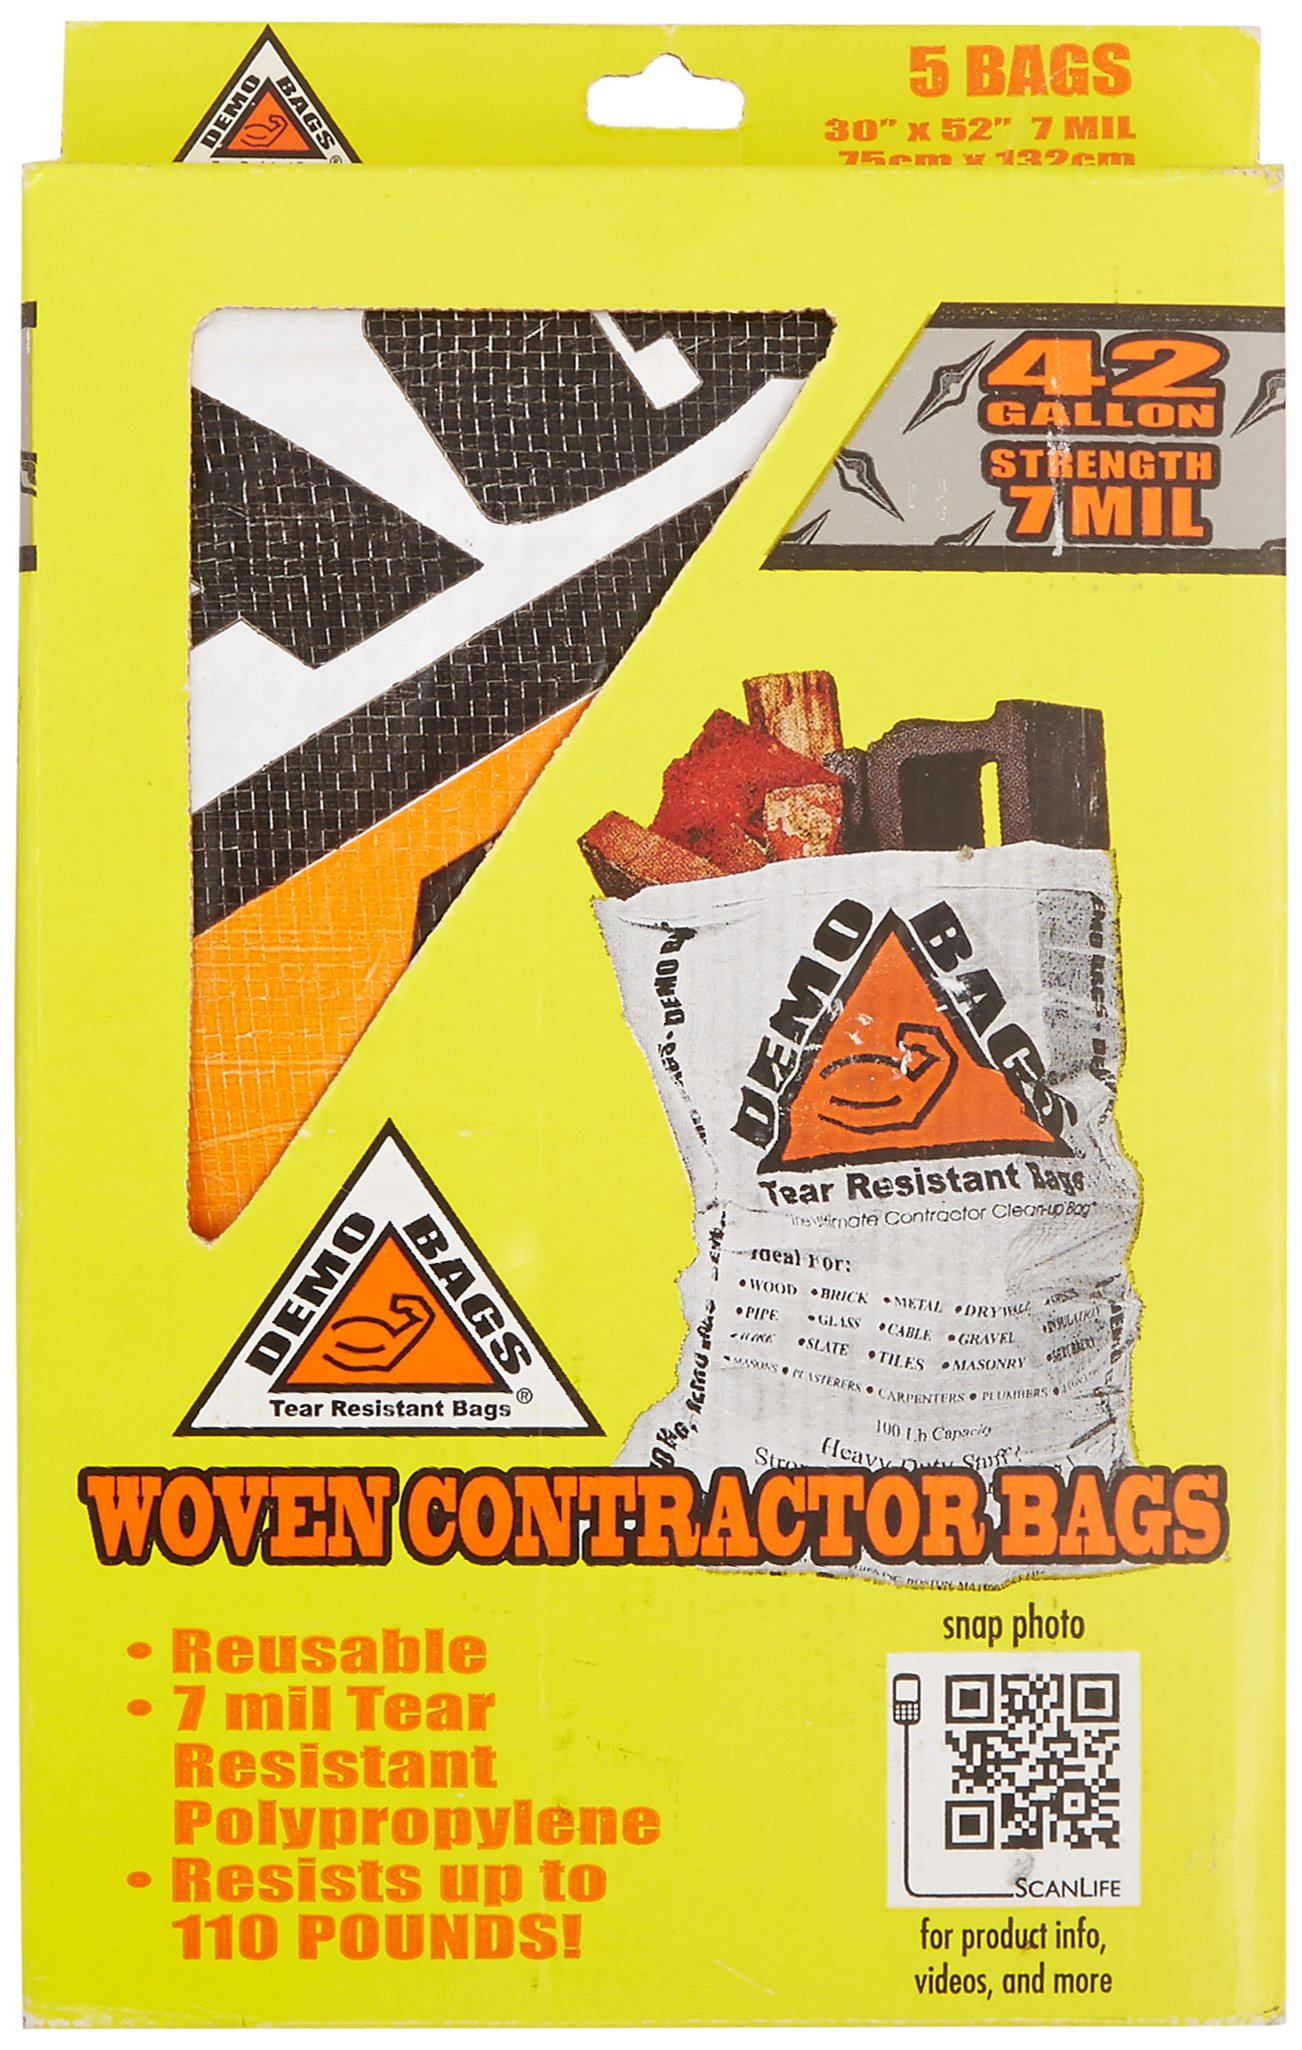 Demo Bags GIDDS2-2481110 Contractor Trash Bag (5 Bags Per Pack), 42 gallon